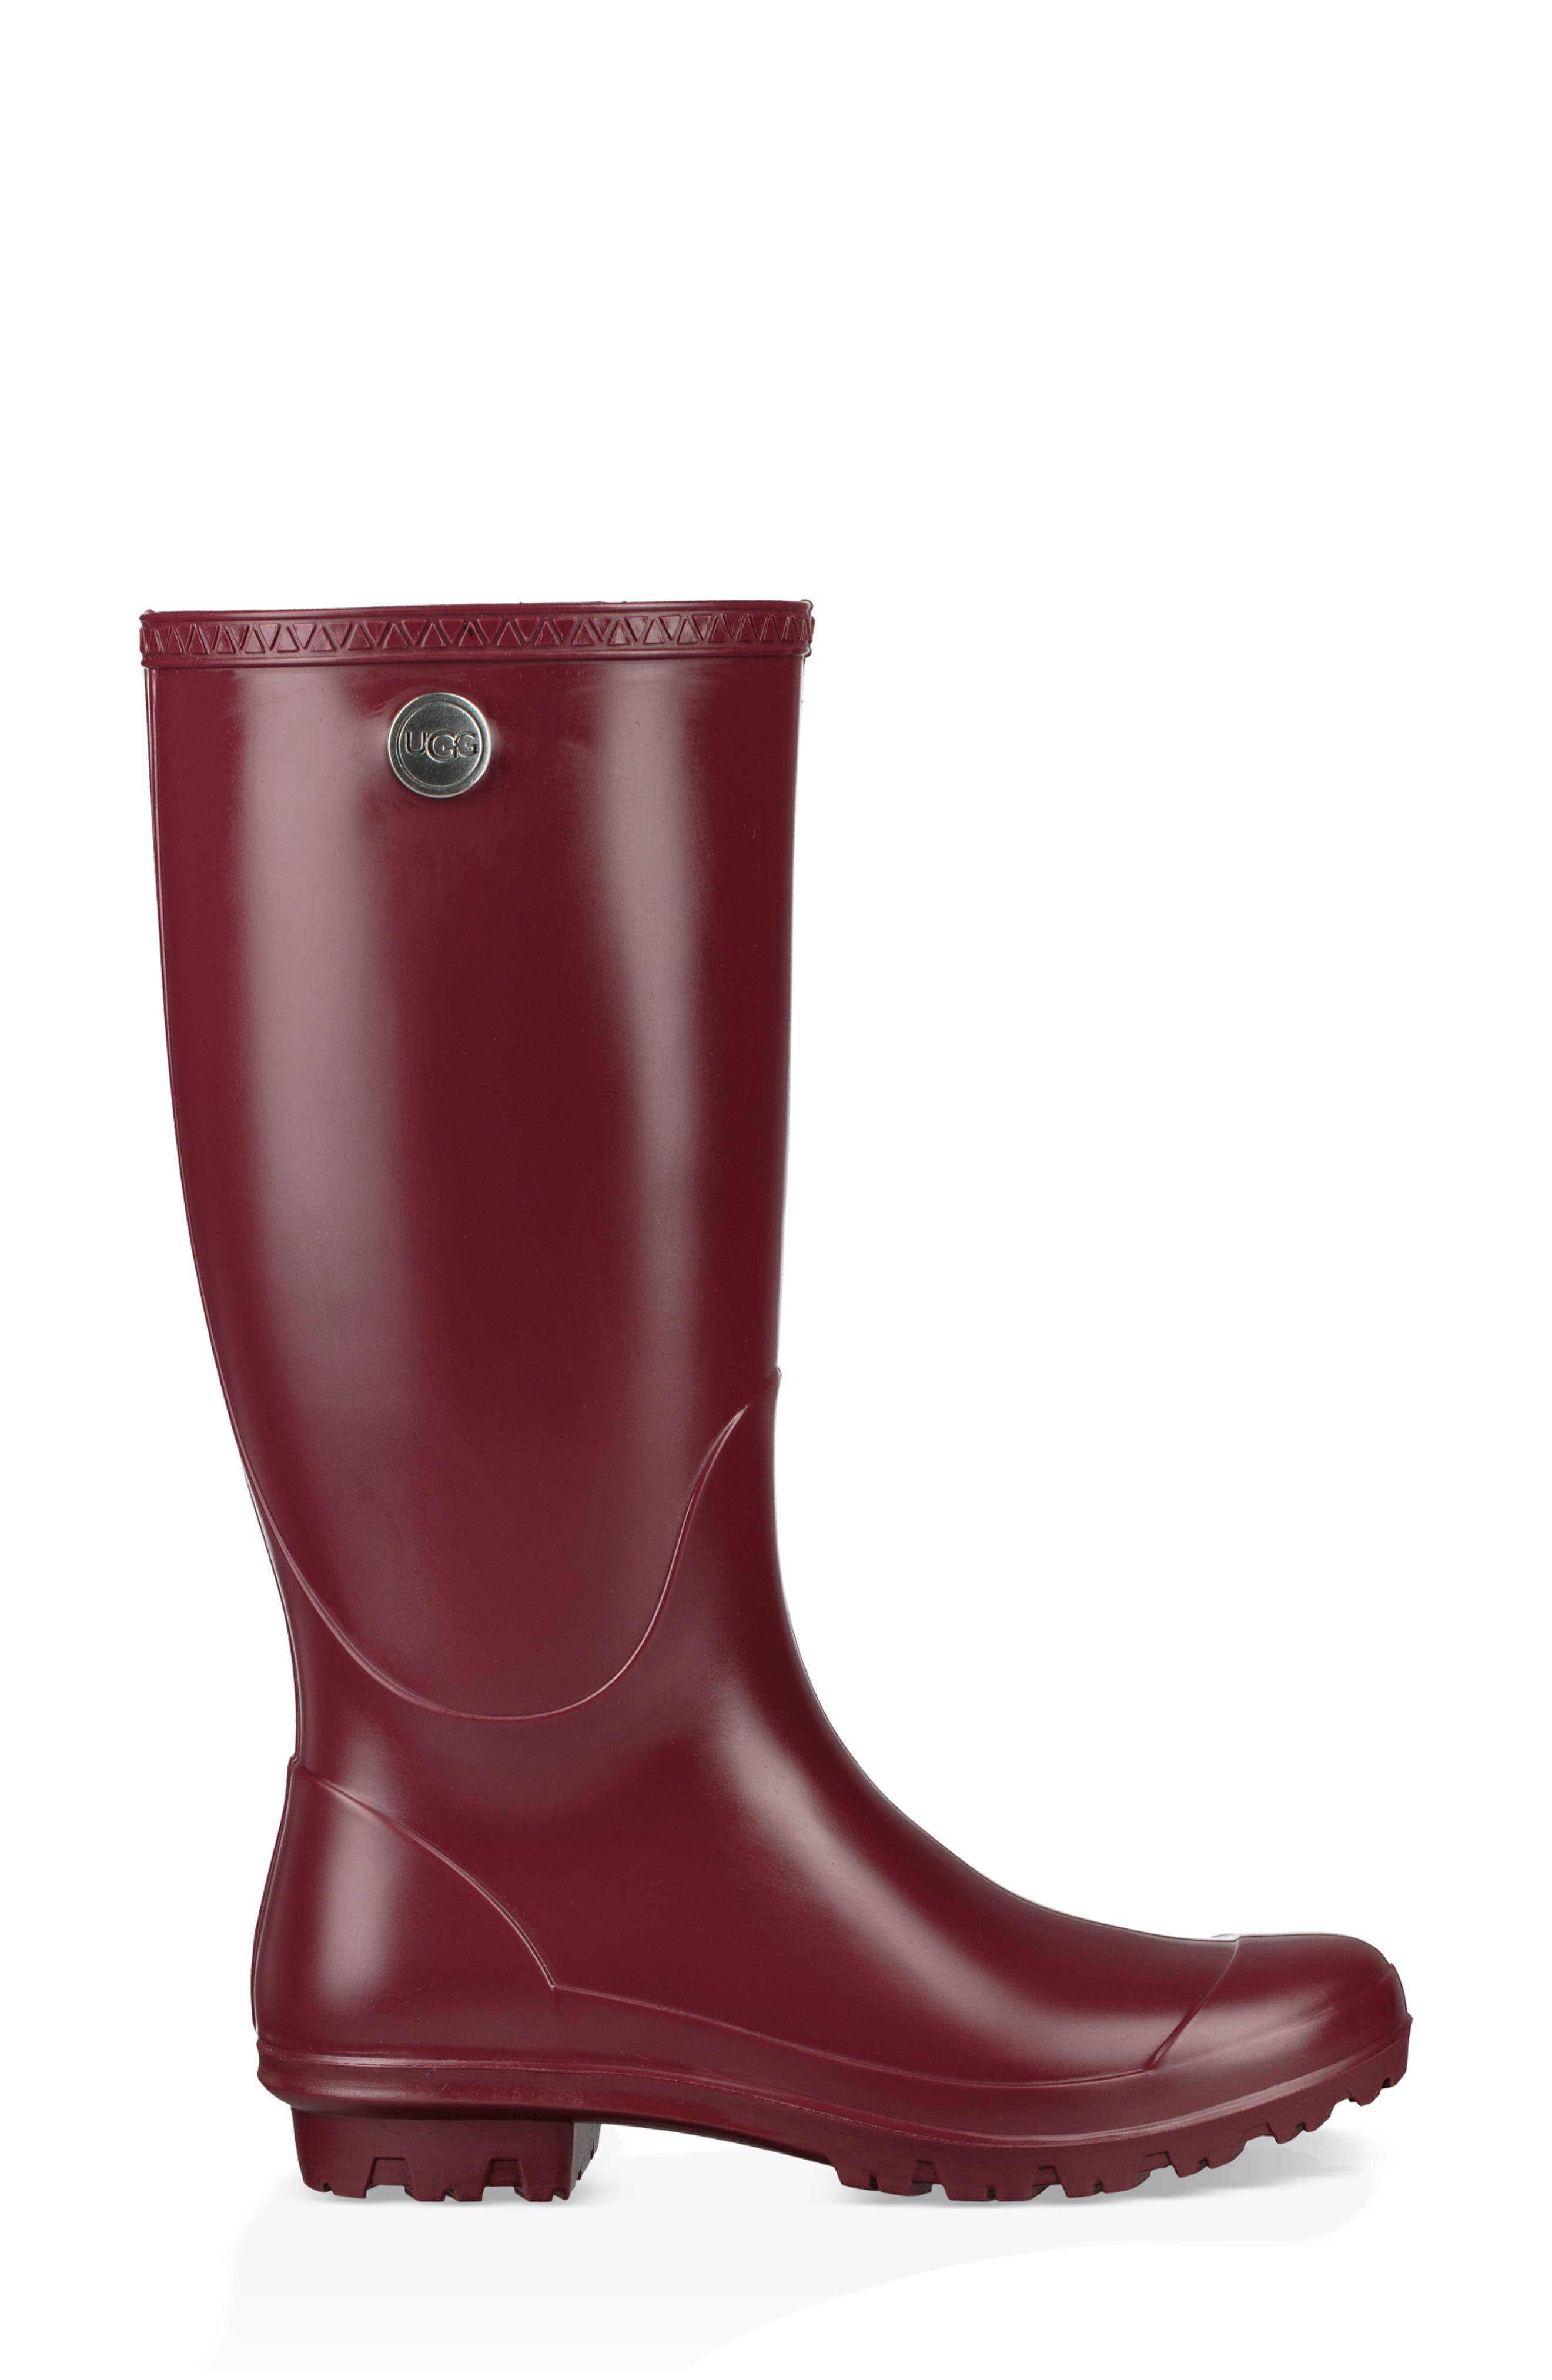 Shelby Matte Waterproof Rain Boot,                             Alternate thumbnail 3, color,                             GARNET RUBBER